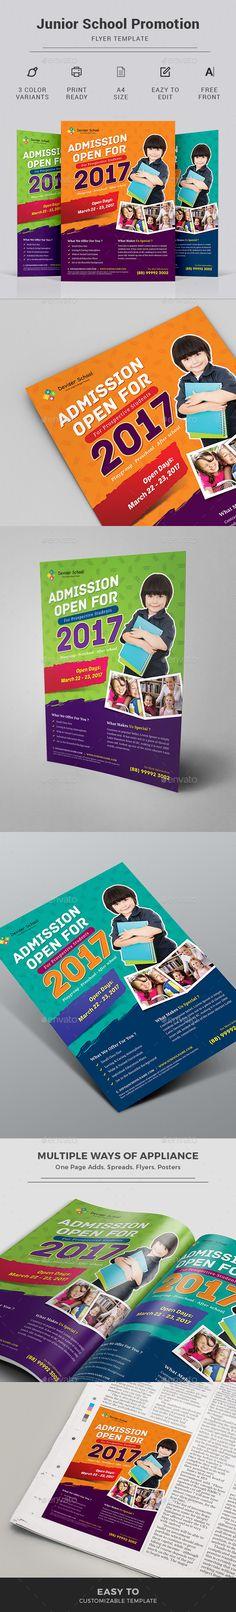 #SchoolFlyerTemplate for school promotion, junior school promotion and kids school promotion. Download http://graphicriver.net/item/school-flyer/16794194?ref=themedevisers